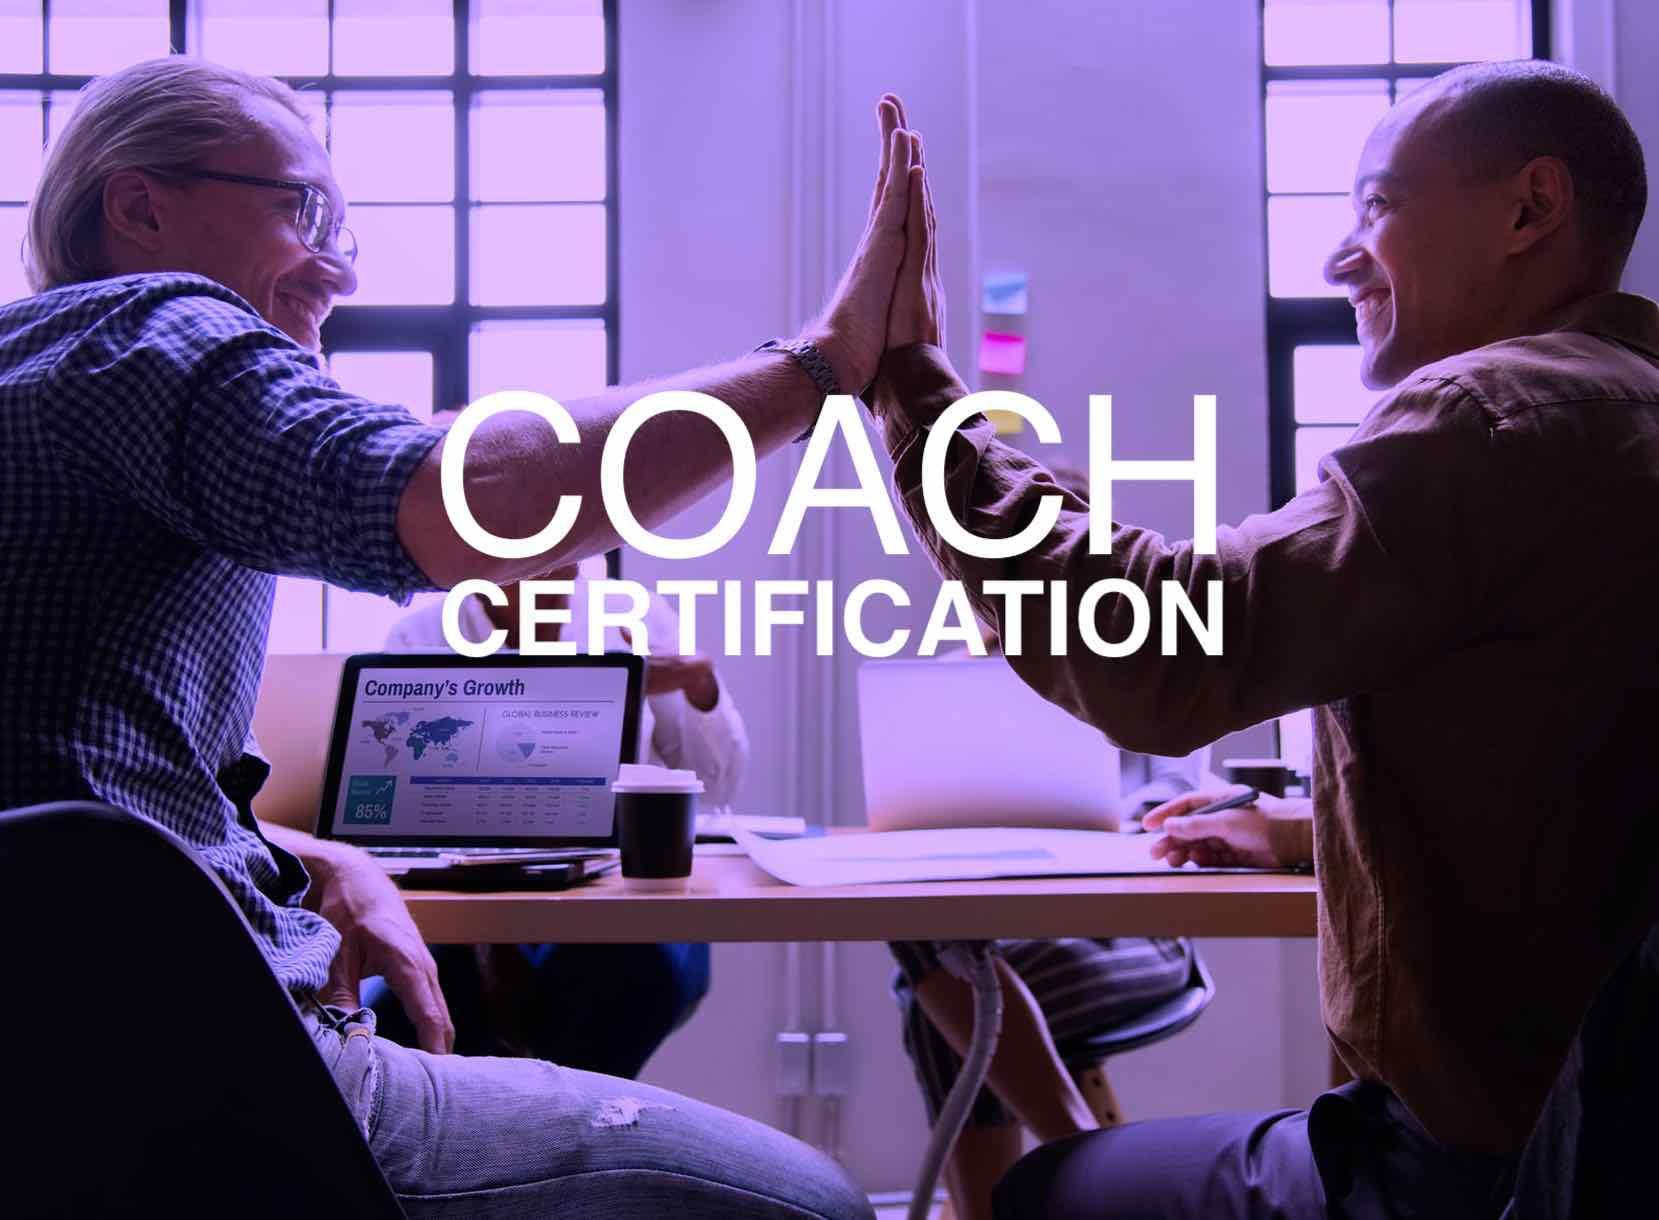 coach cert pic - Nehemiah E-Community